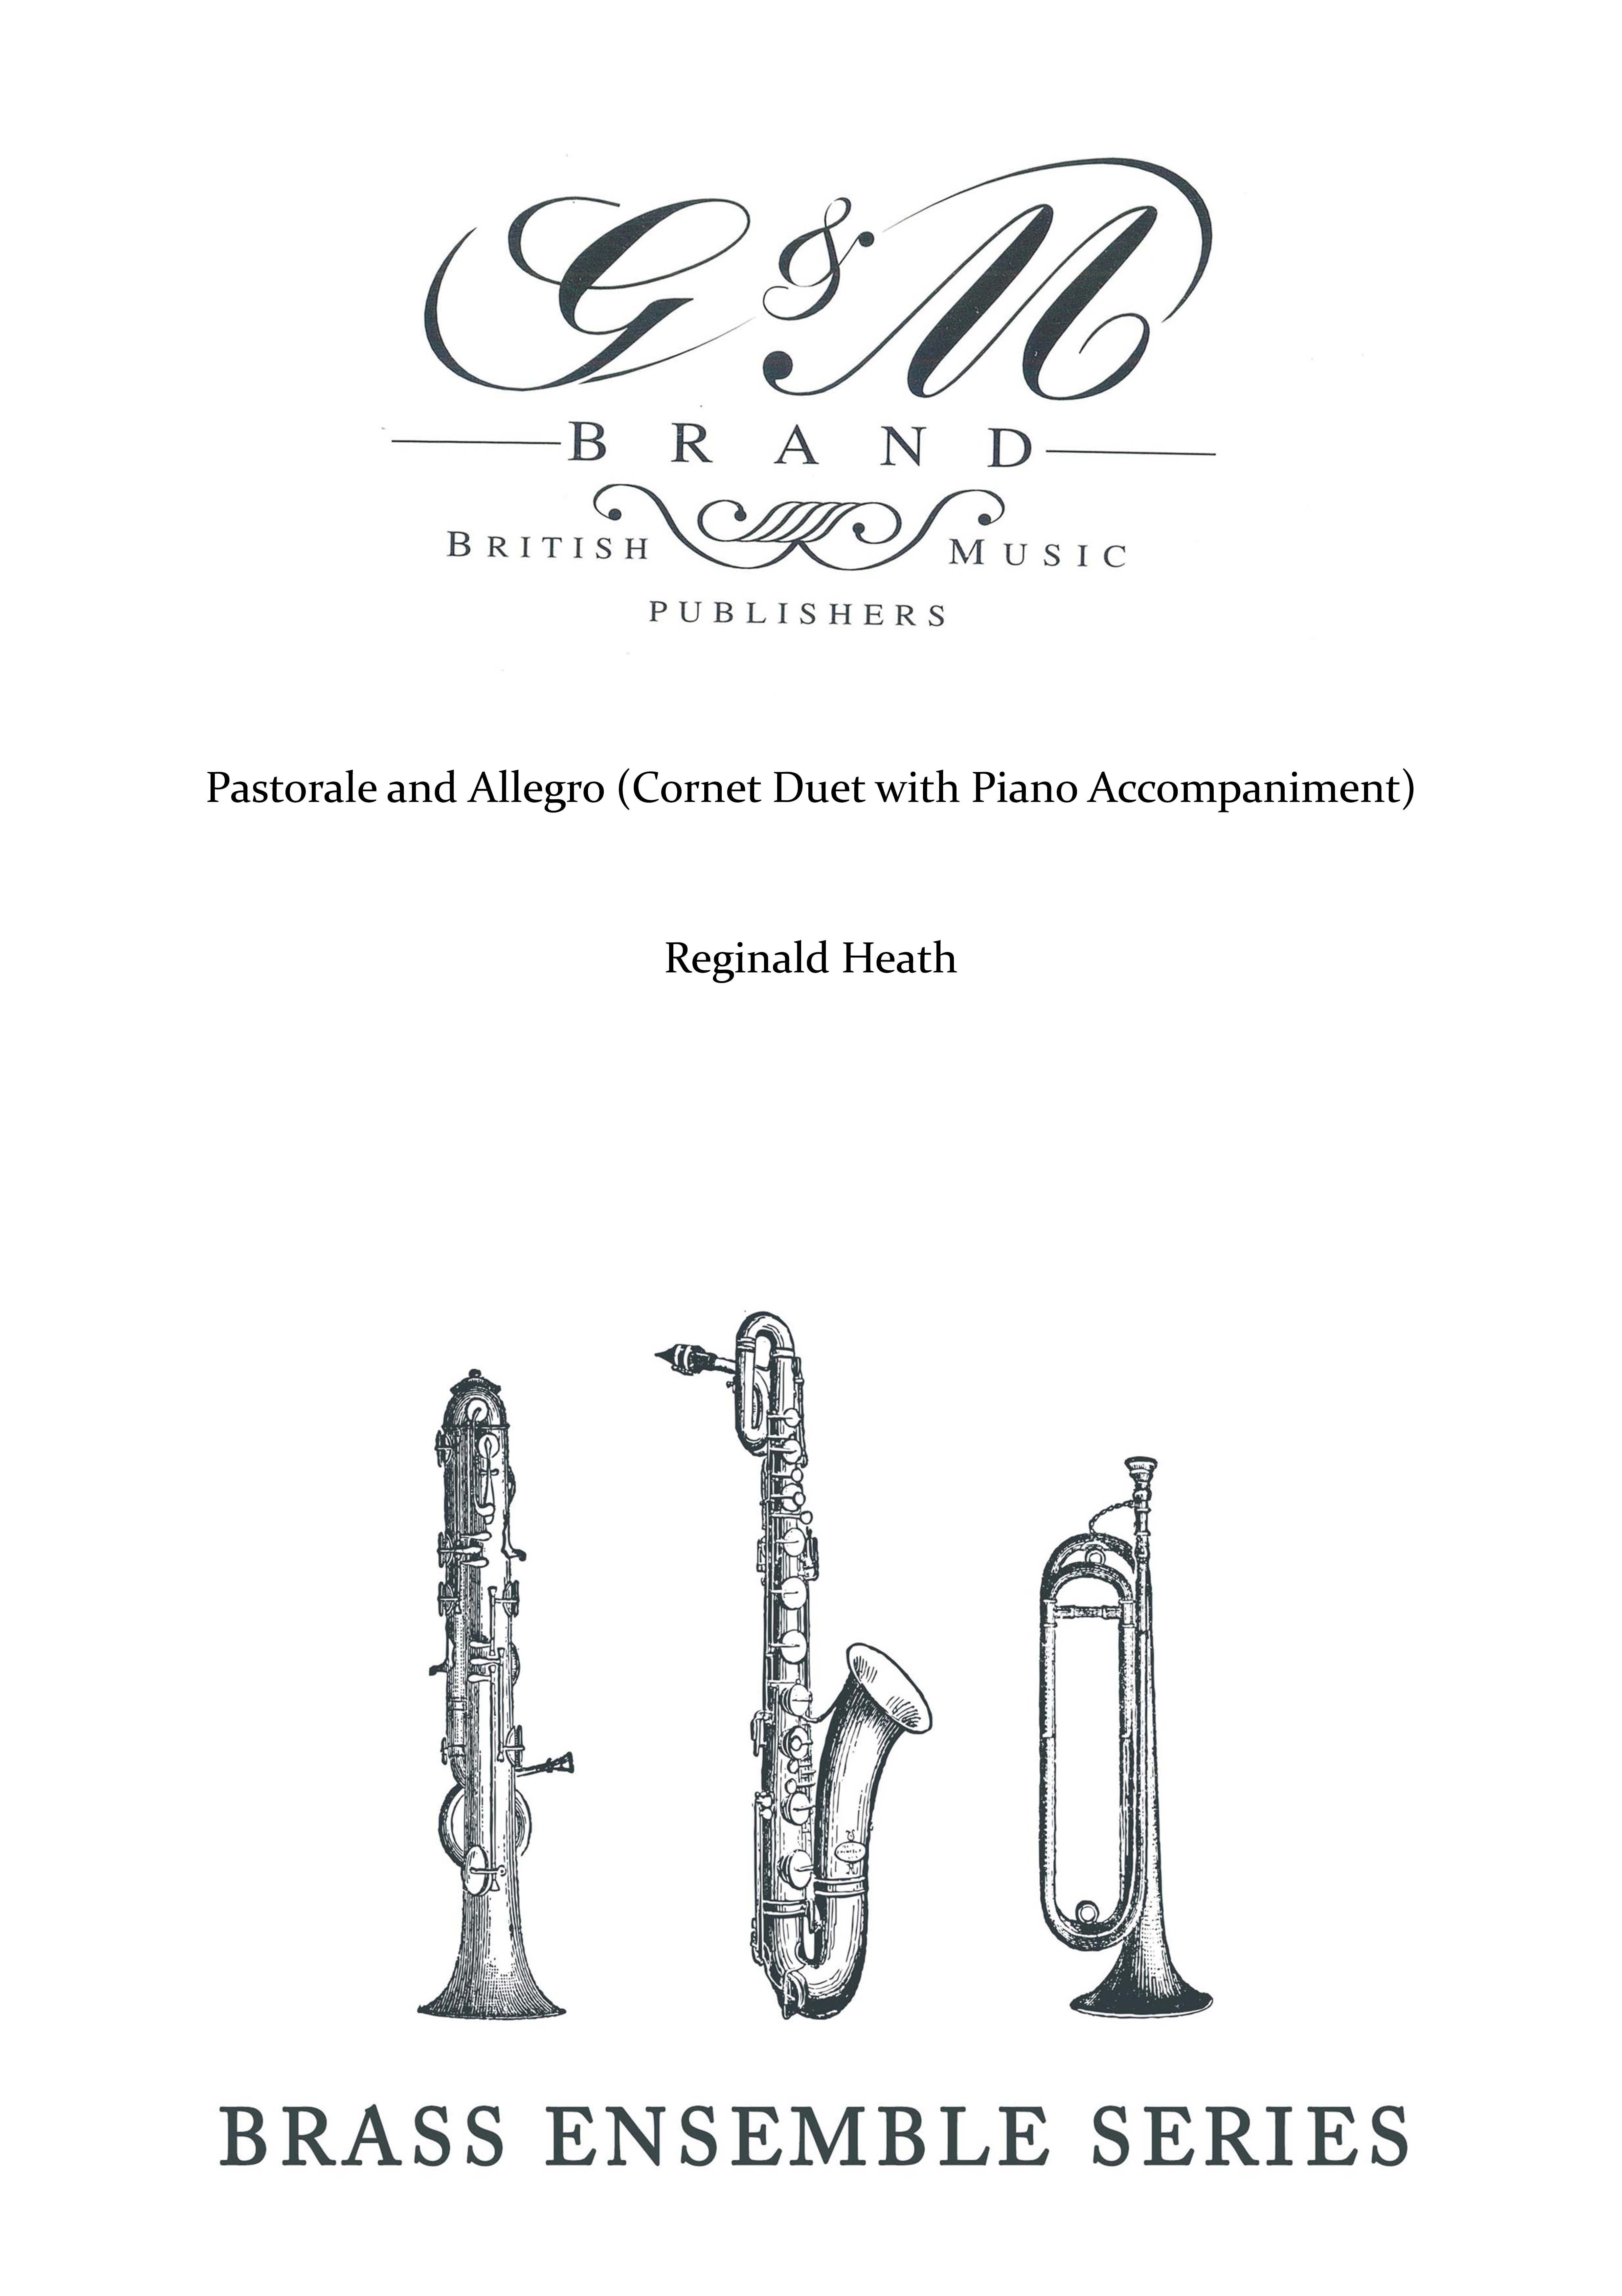 Pastorale and Allegro (Cornet Duet with Piano Accompaniment)